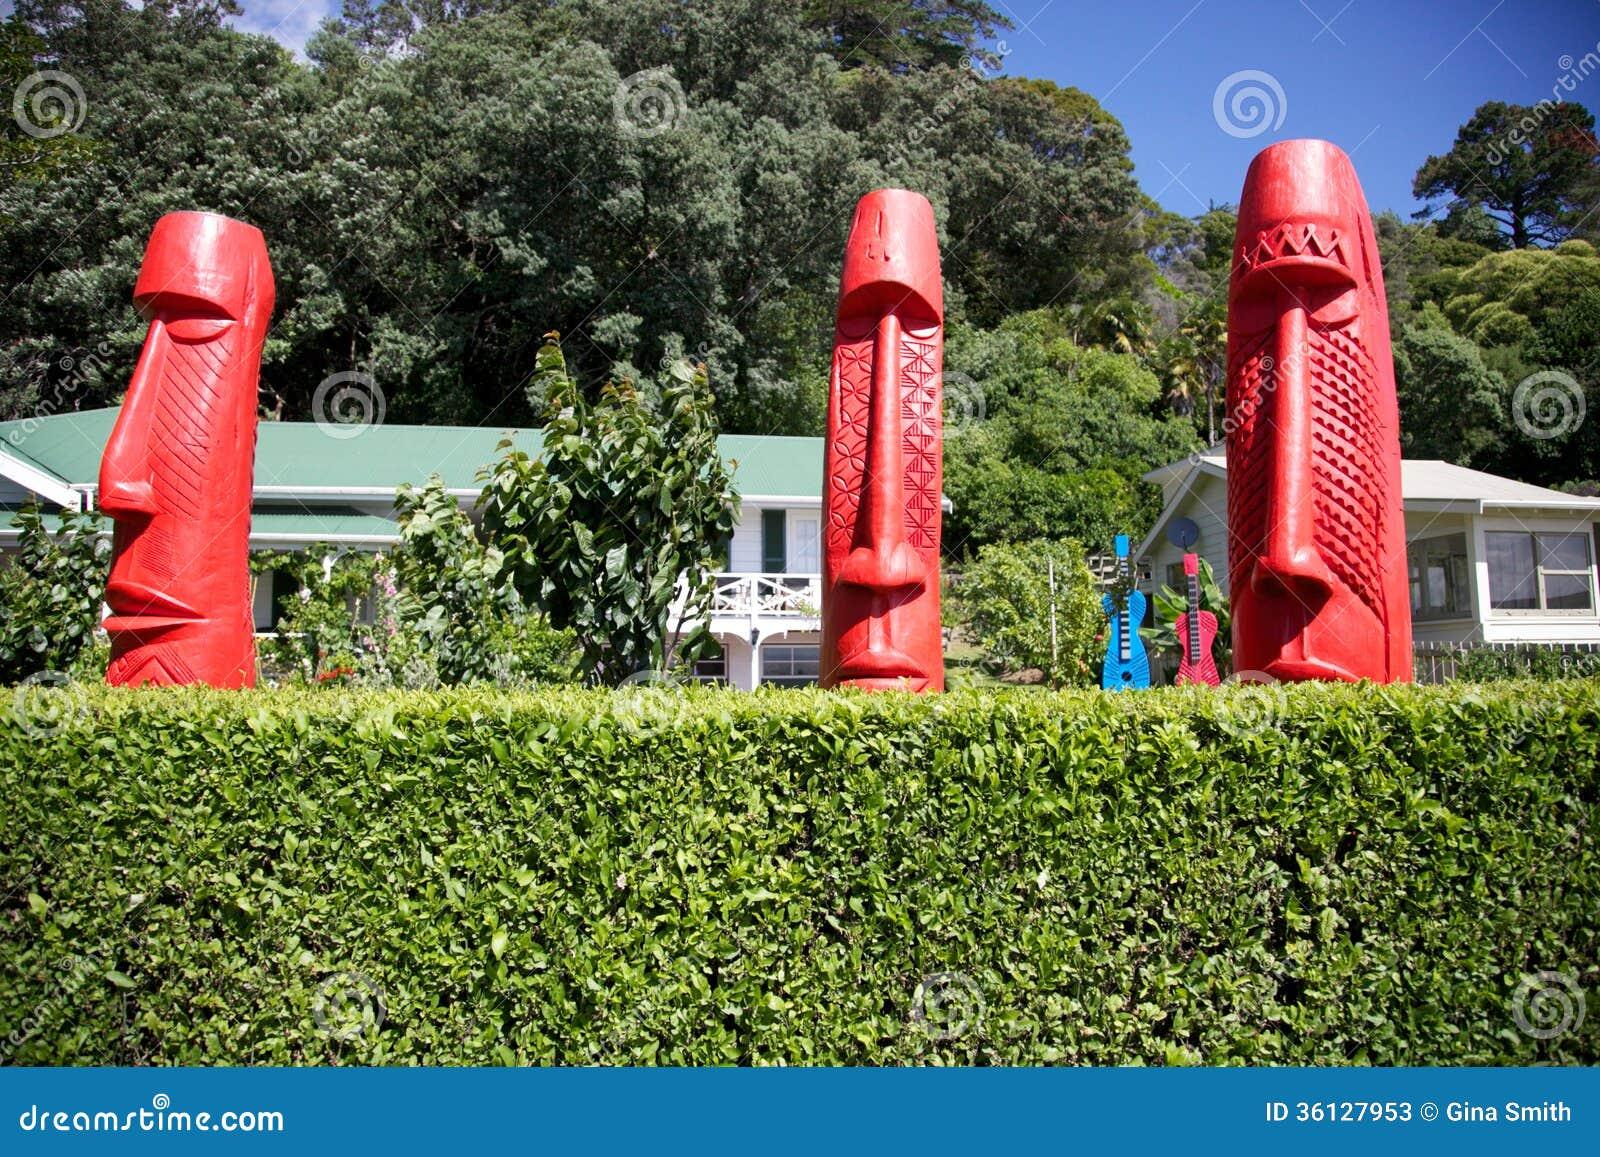 Ethnic sculptures